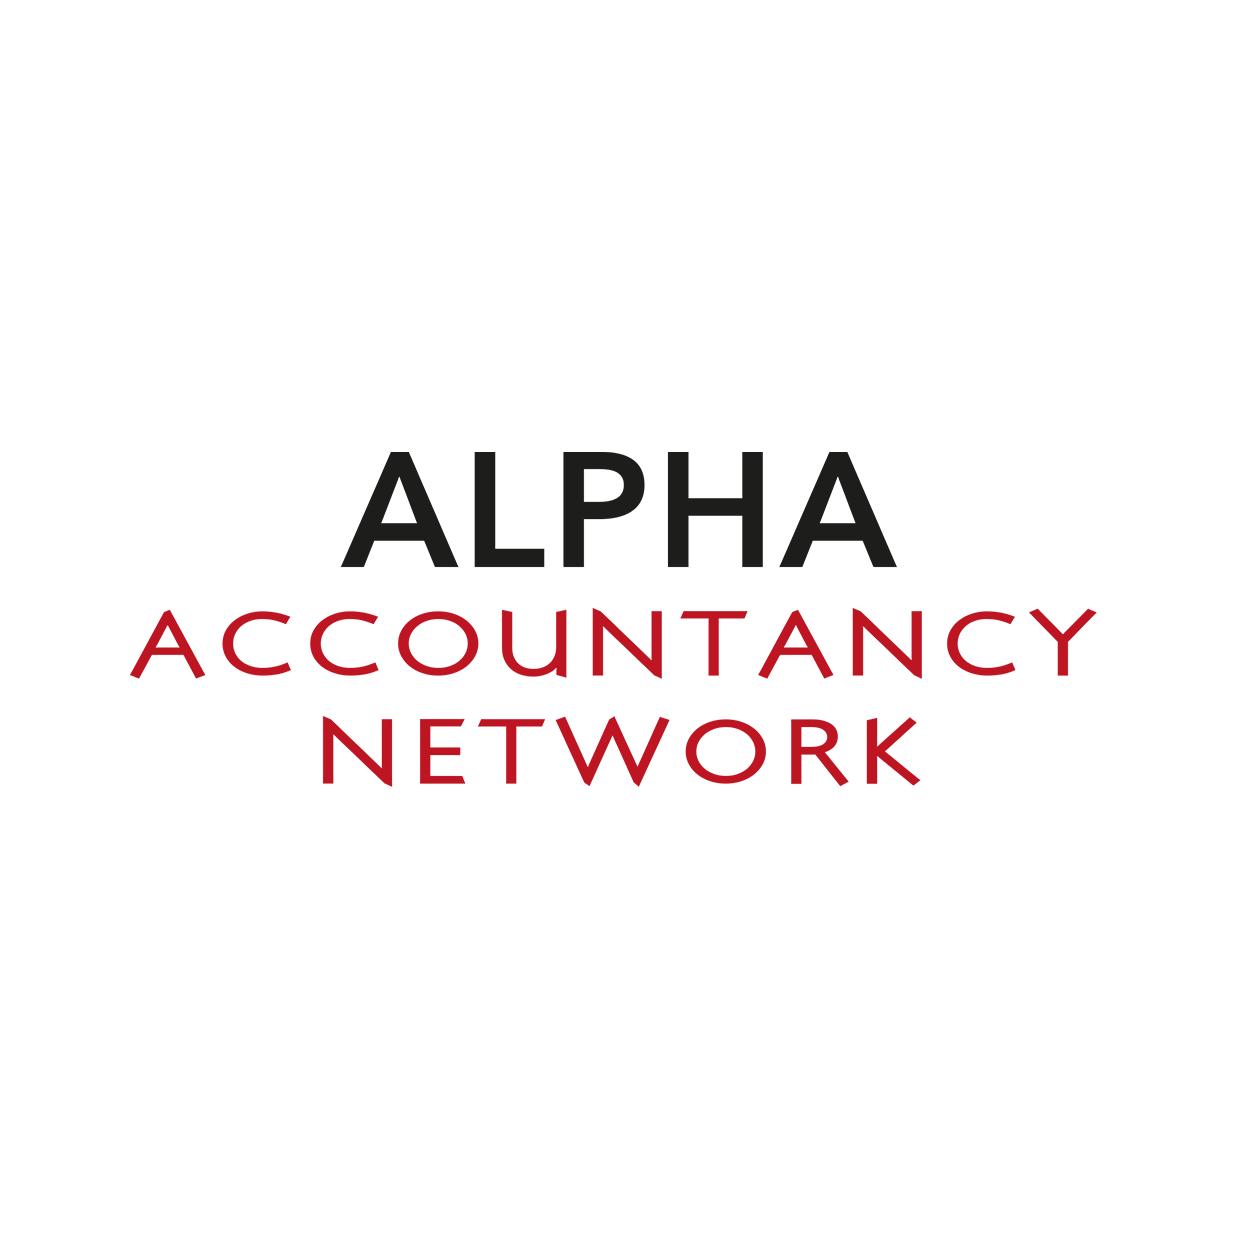 Alpha Accountancy Network